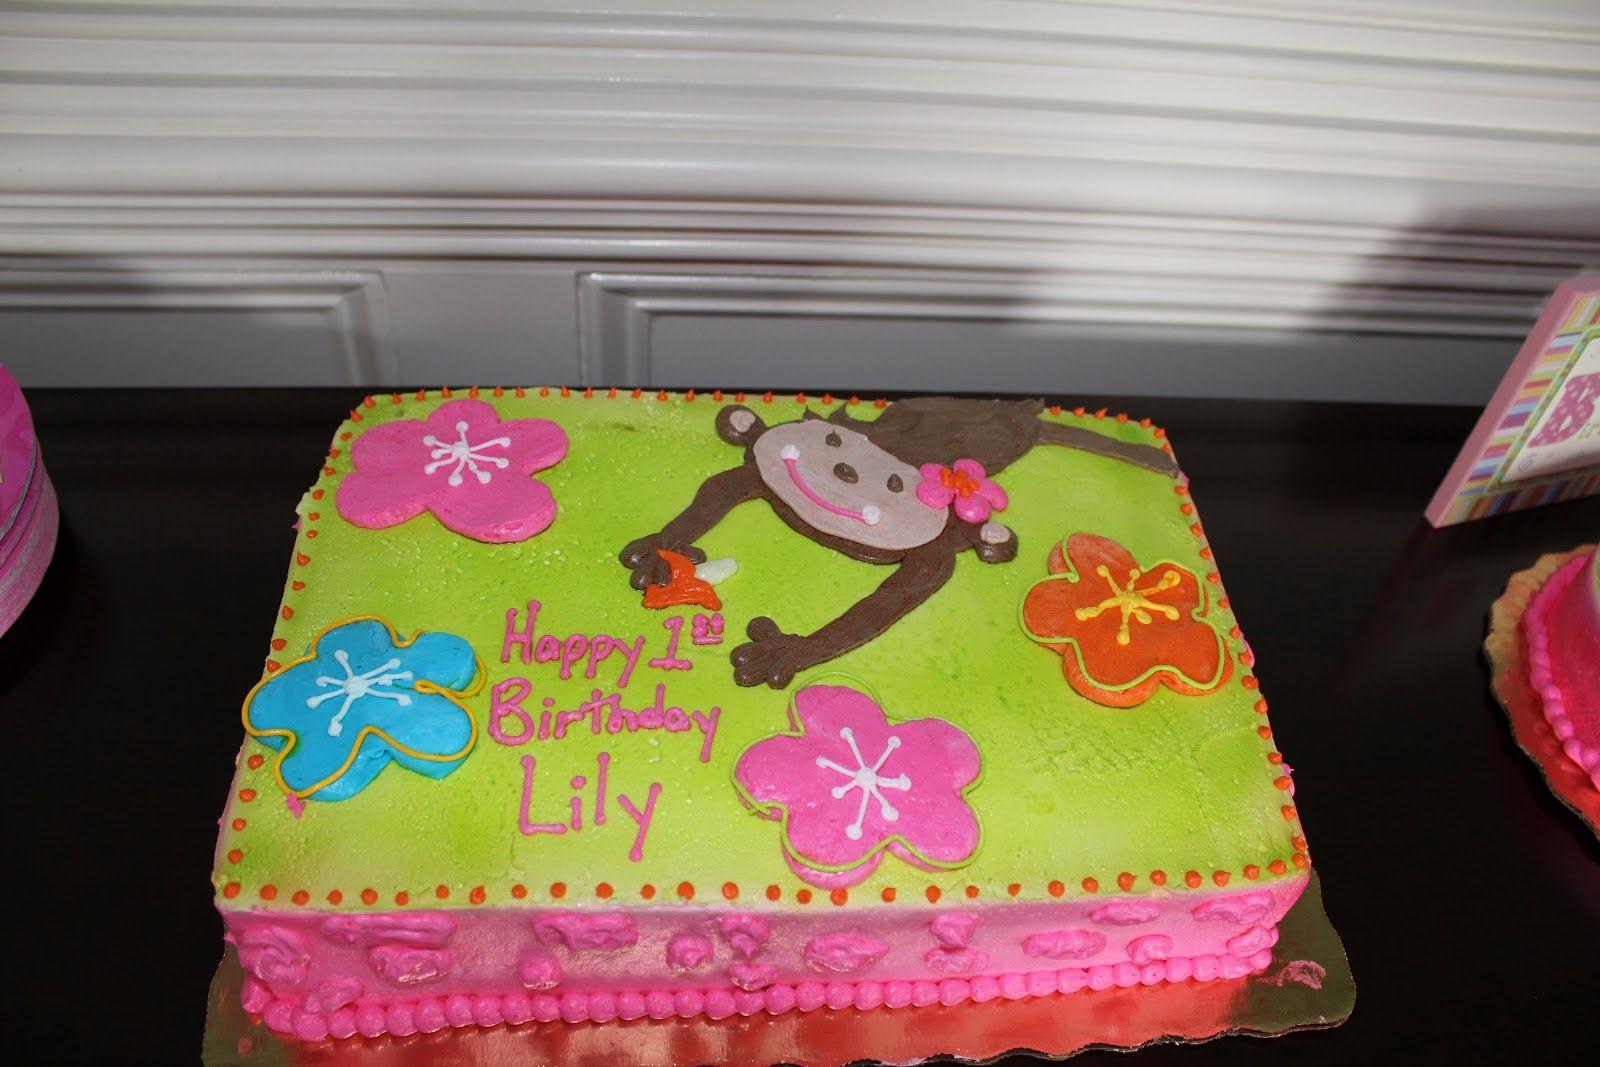 All things thornton lilys 1st birthdaymonkey theme